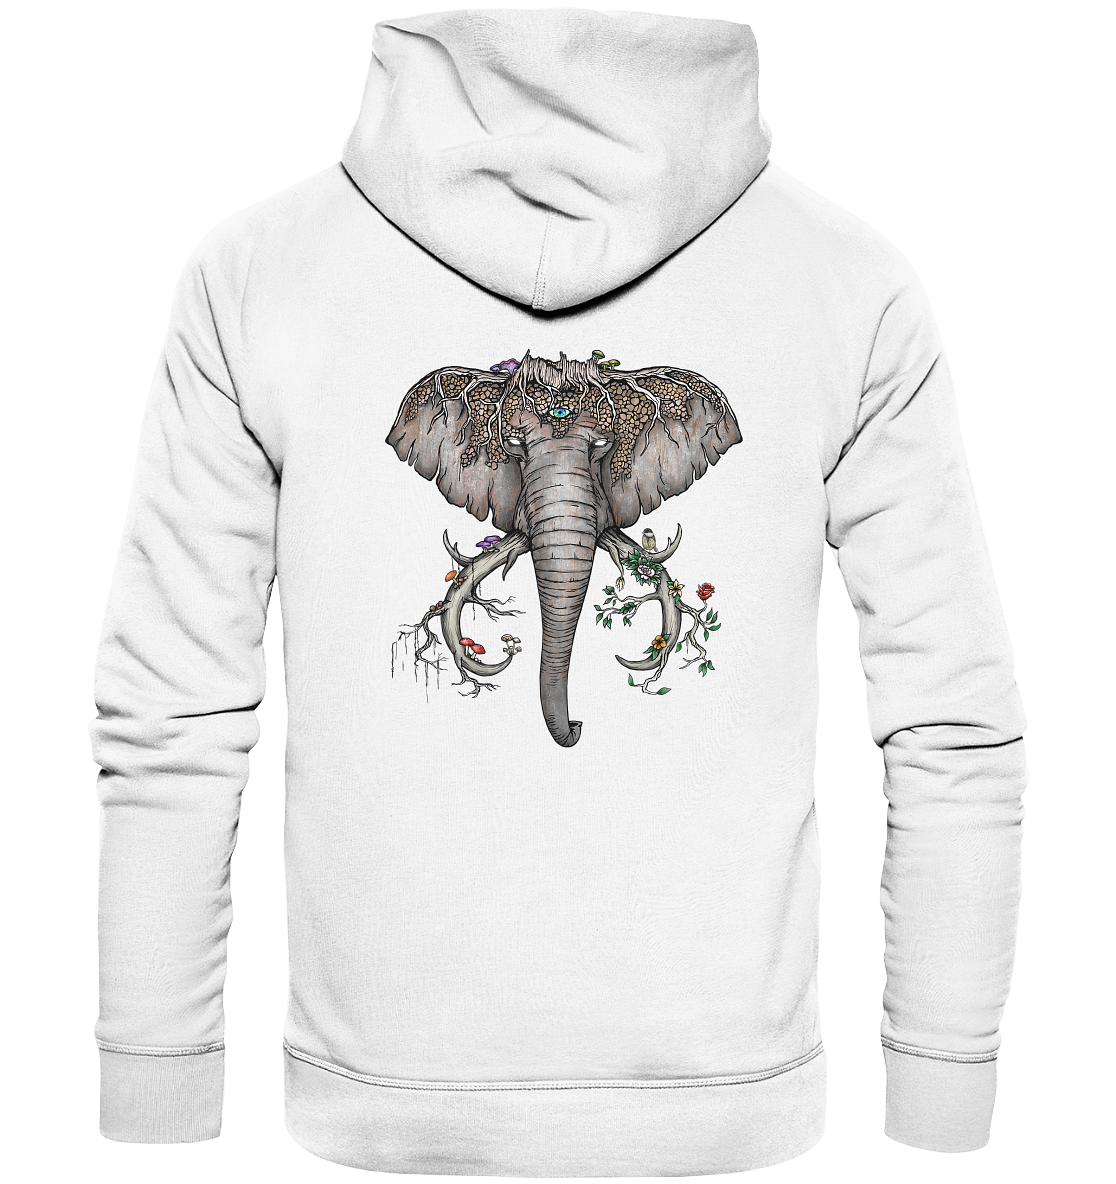 back-organic-hoodie-f8f8f8-1116x-1.png